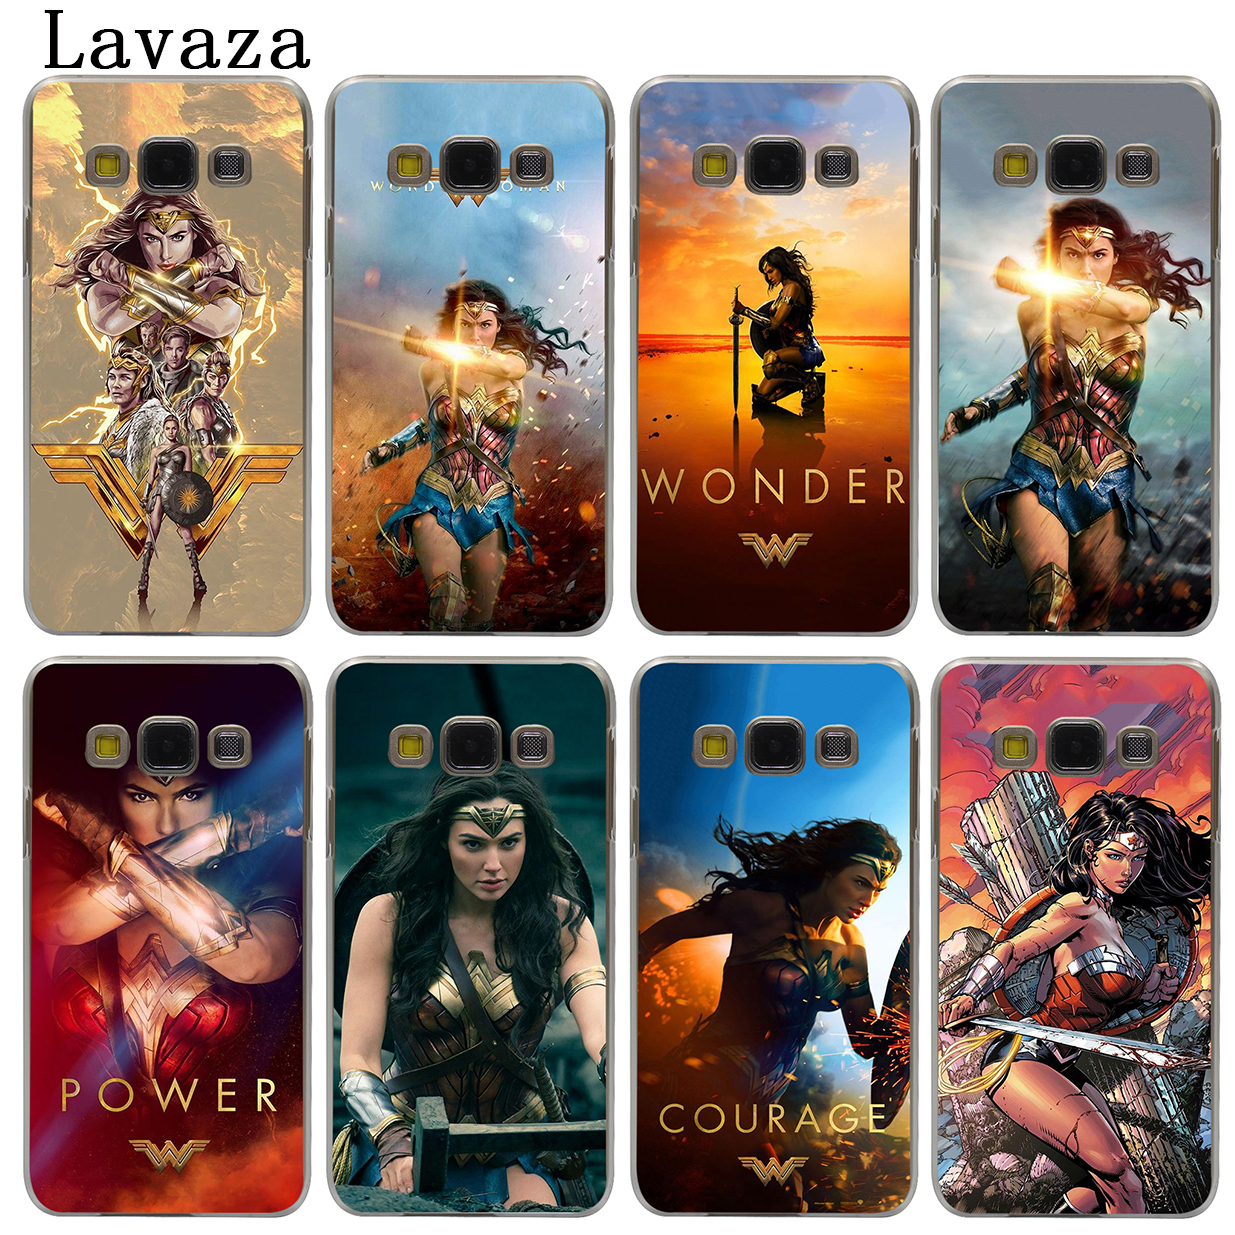 Lavaza Wonder Woman Жесткий Чехол для samsung Galaxy J7 J1 J2 J3 J5 2015 2016 2017 Прайм про Ace 2018 случаев